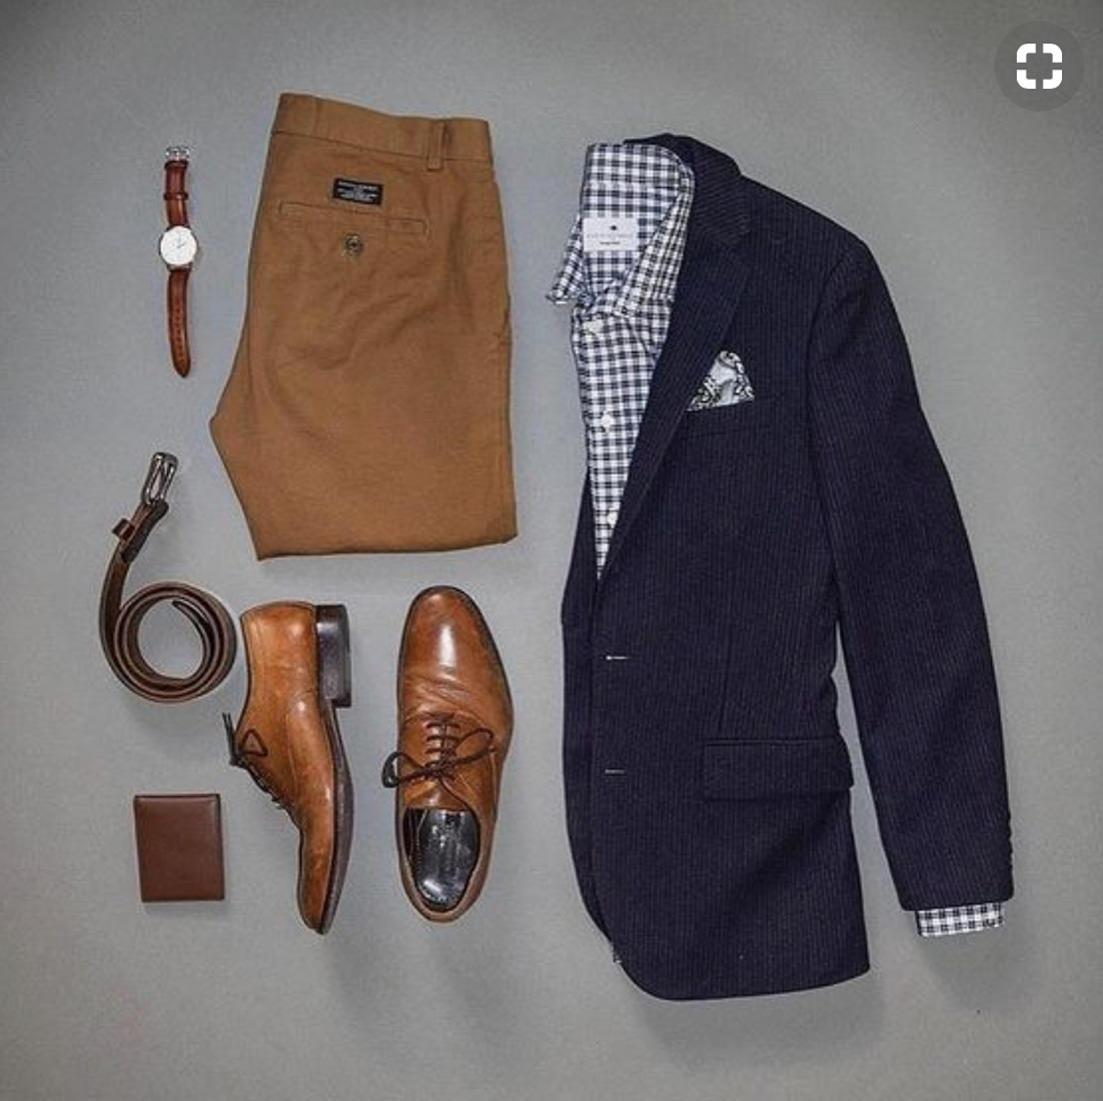 mens-outfit-set-4.jpg